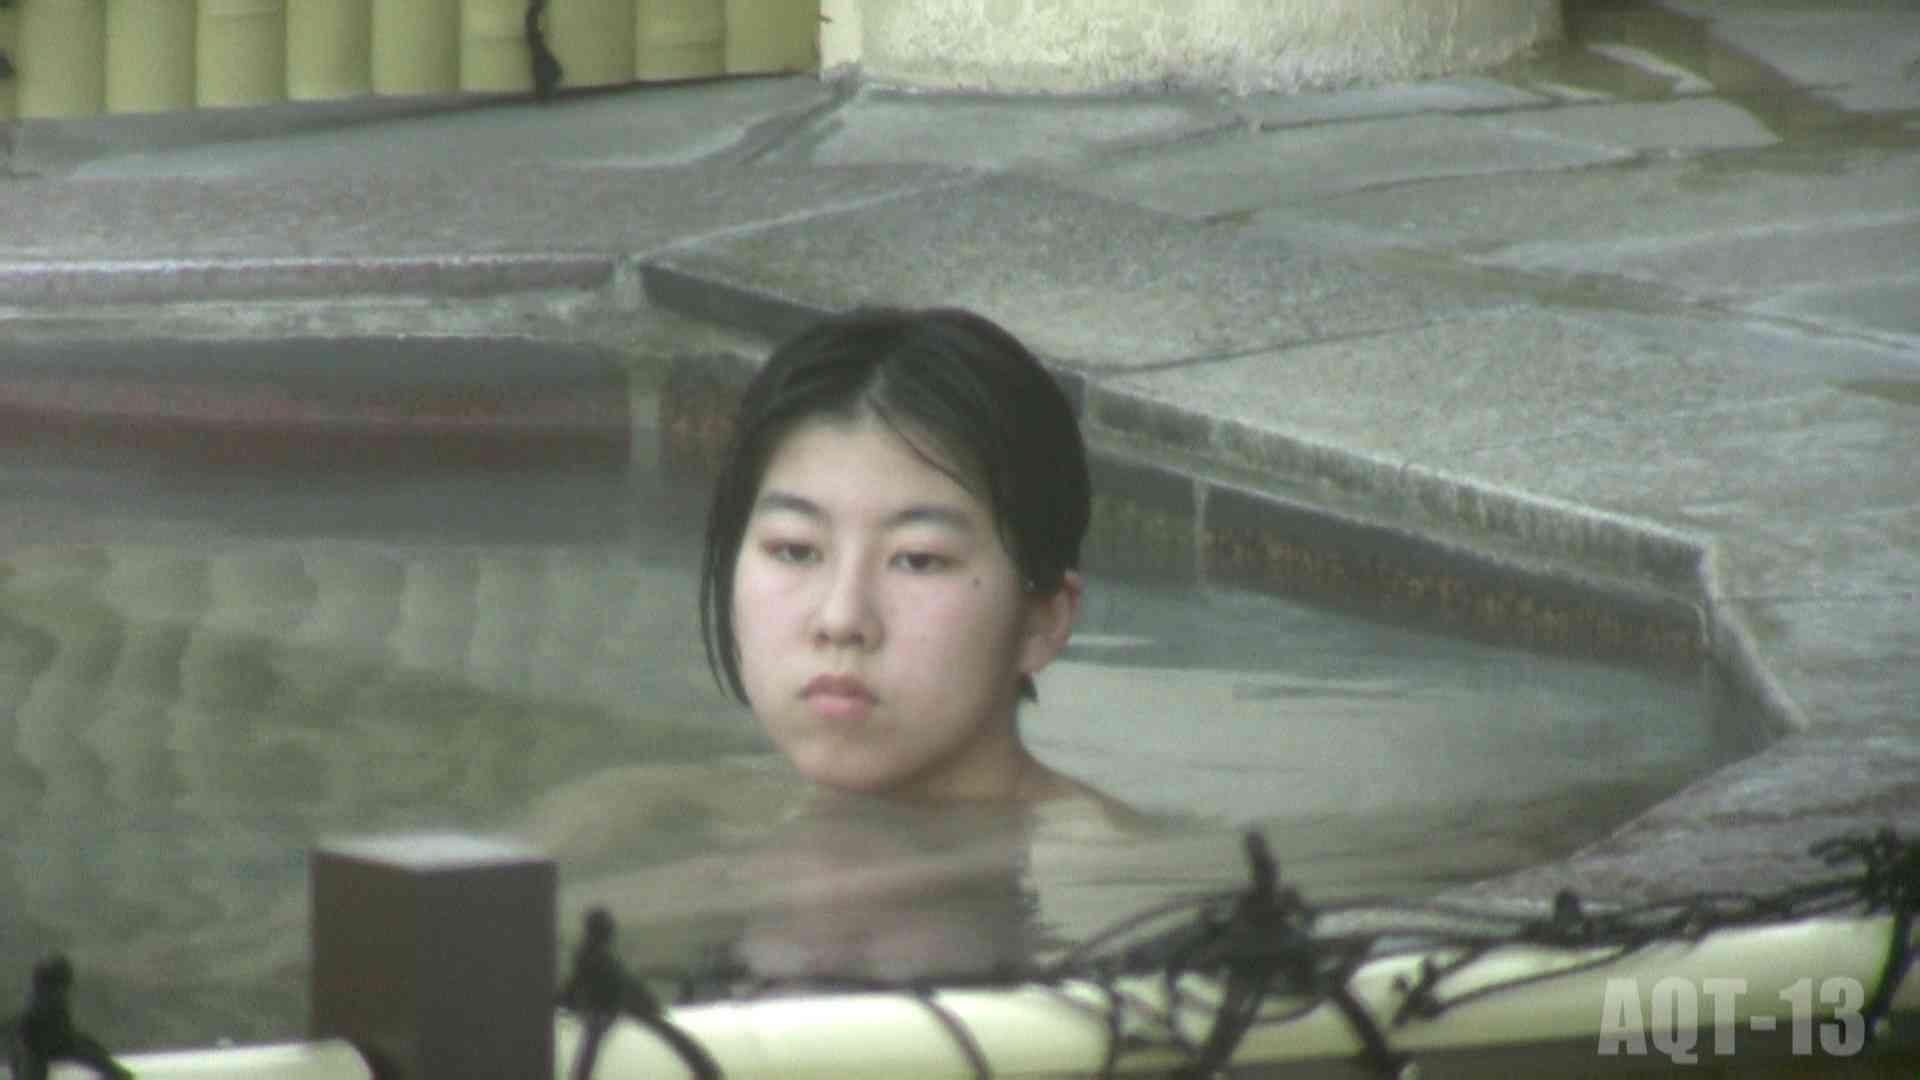 Aquaな露天風呂Vol.816 盗撮 盗み撮り動画キャプチャ 90連発 32